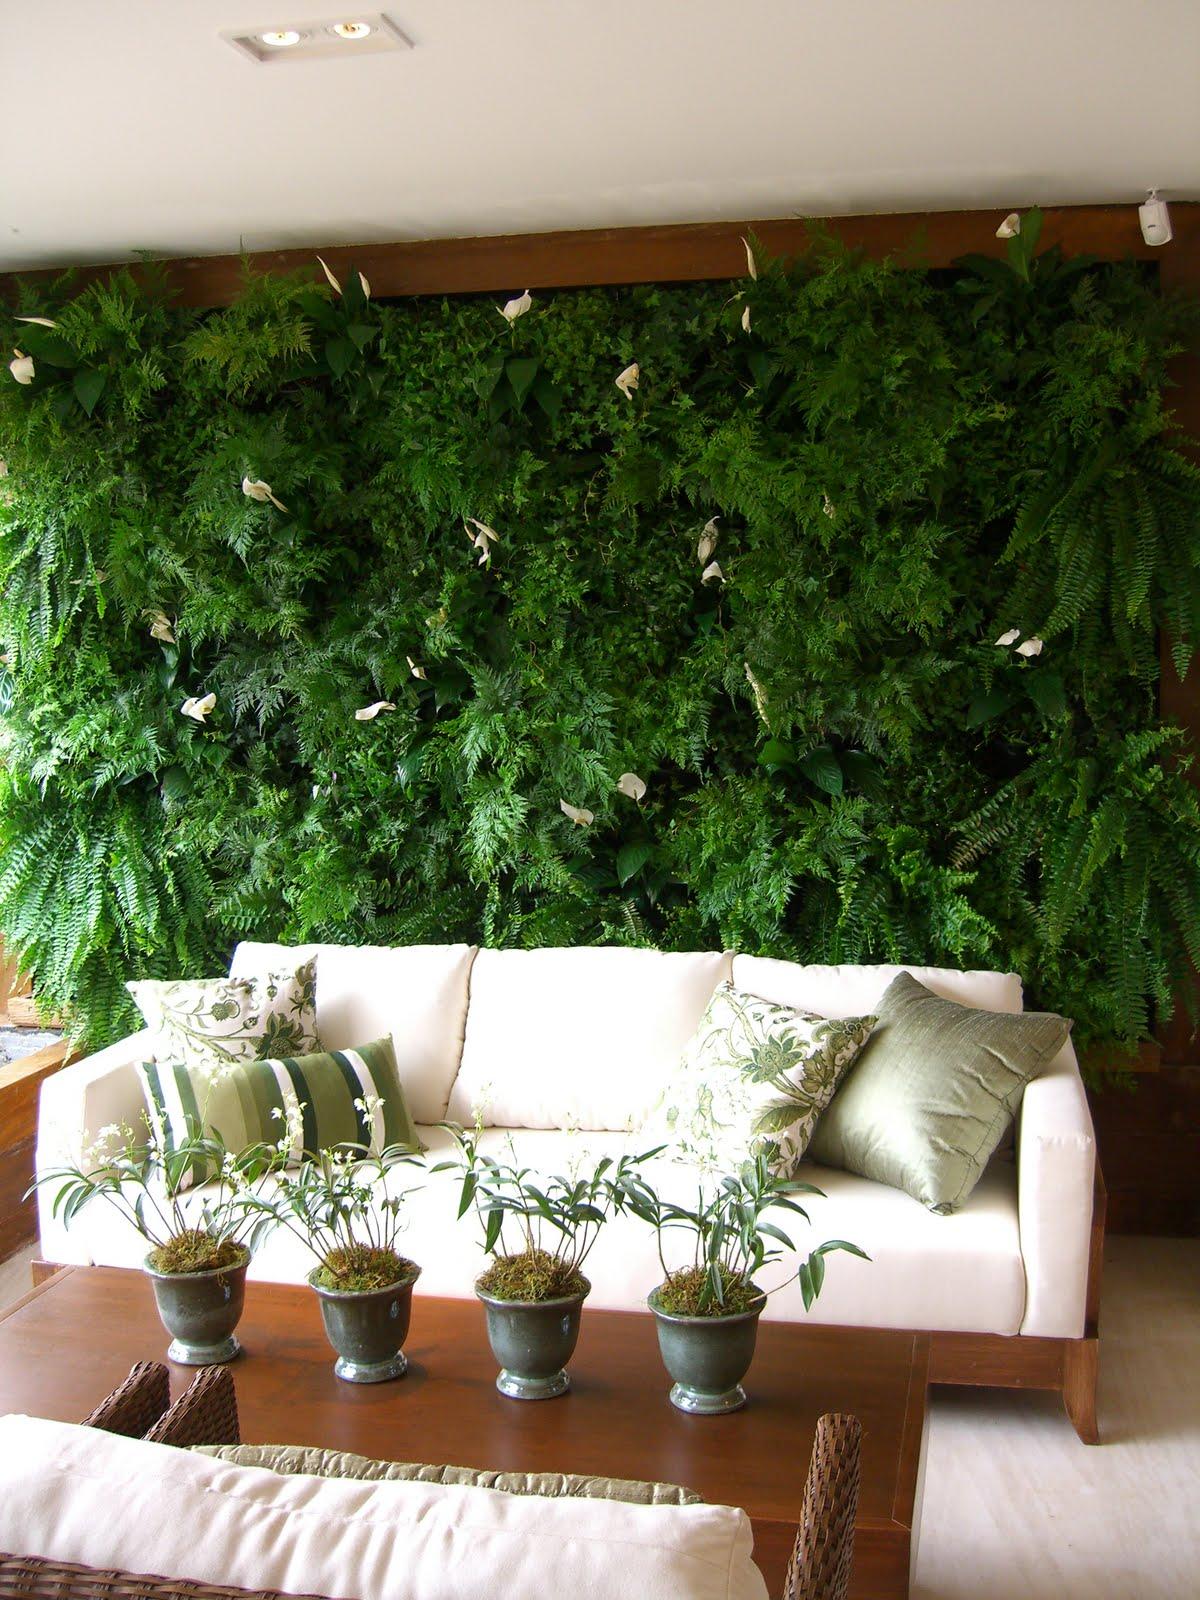 jardim vertical simples : jardim vertical simples:Jardim Vertical